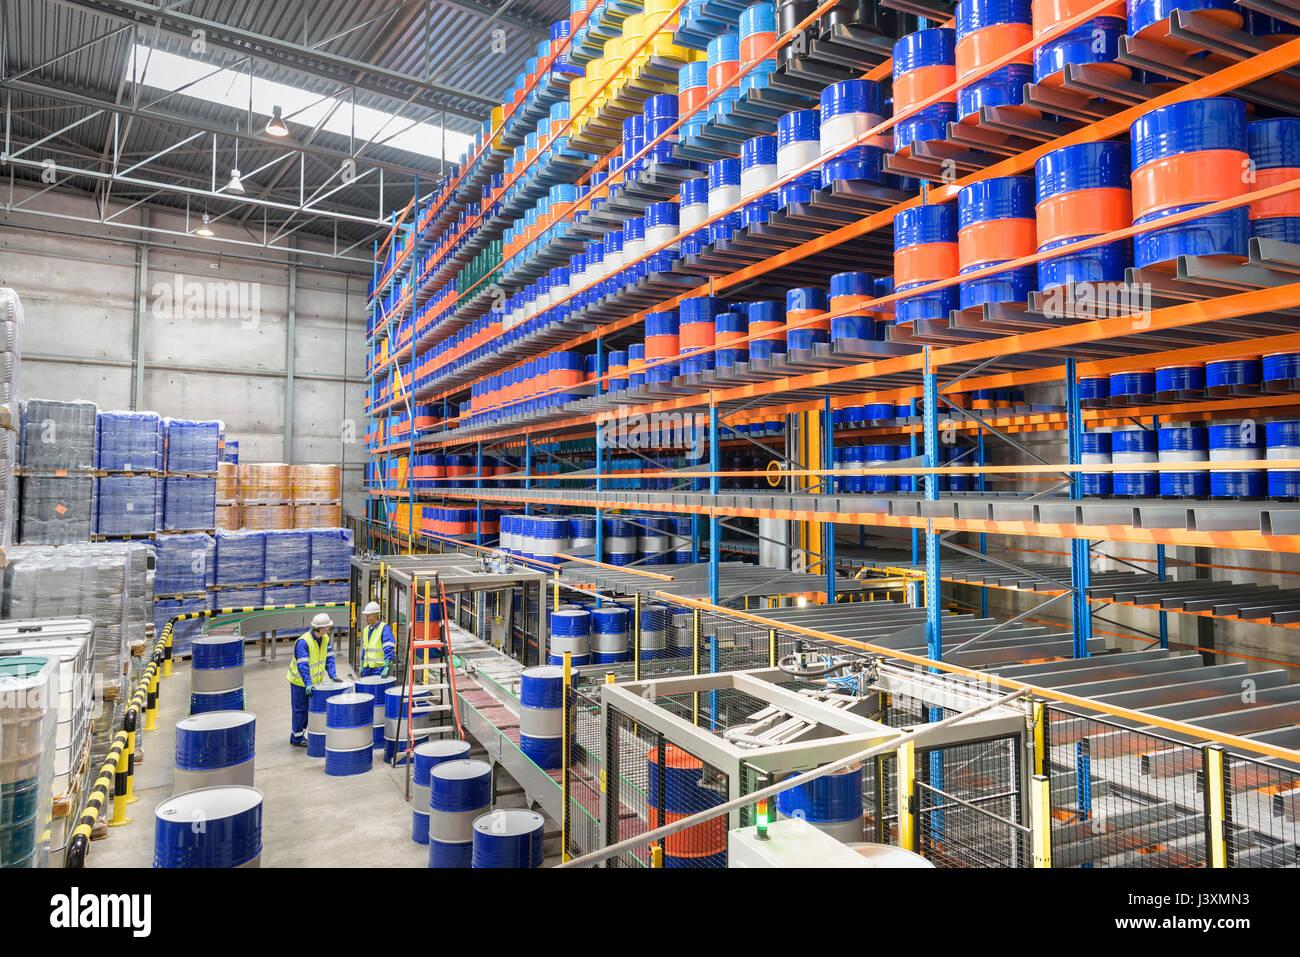 Oil barrels in robotic storage in oil blending factory - Stock Image